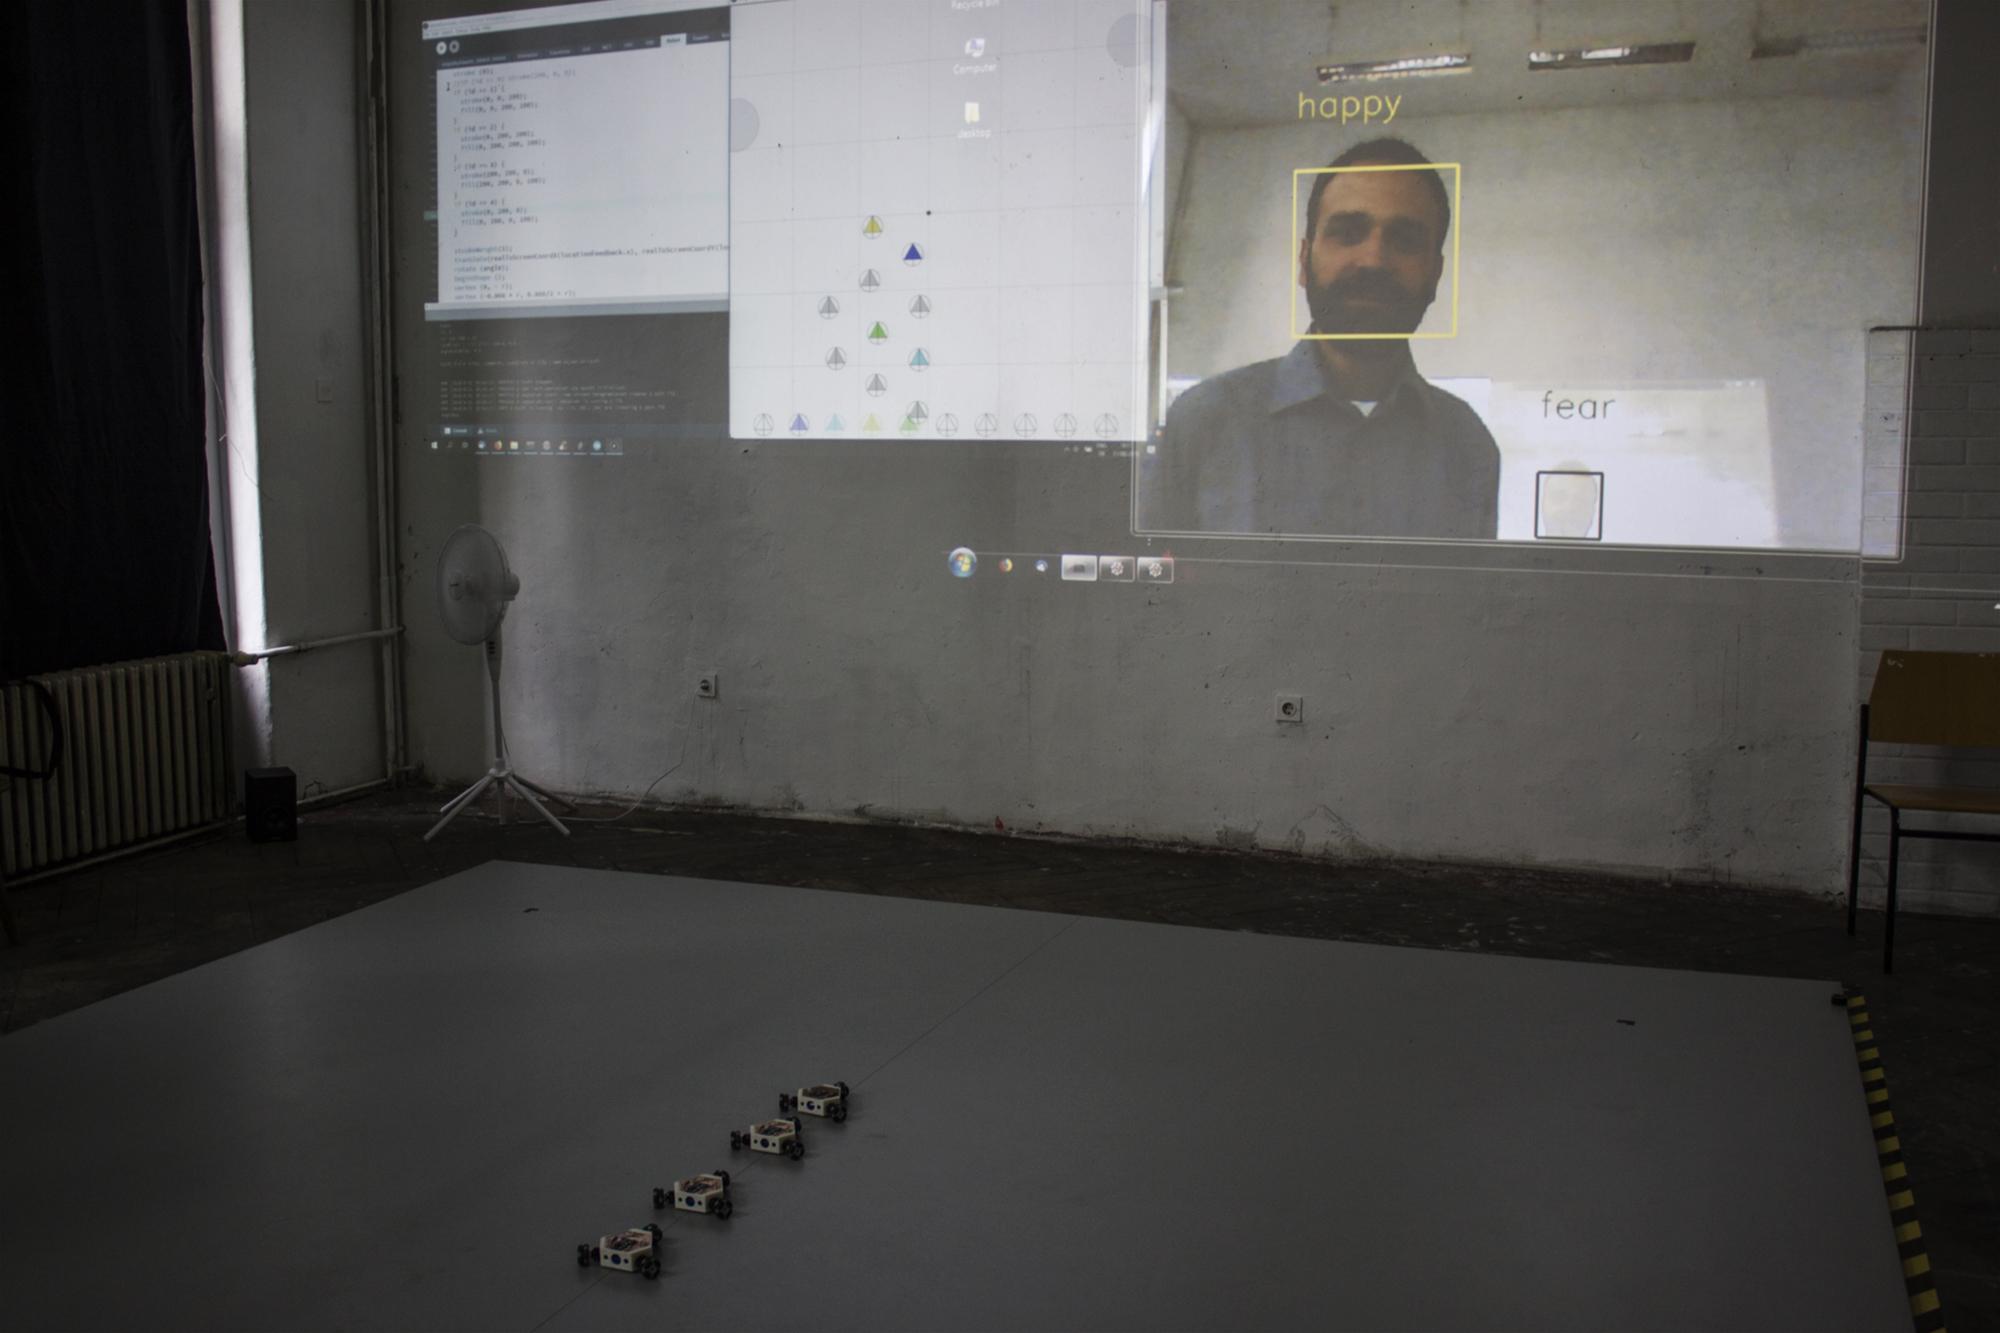 open_studio_empathy_swarm_robots_sm_0023_01